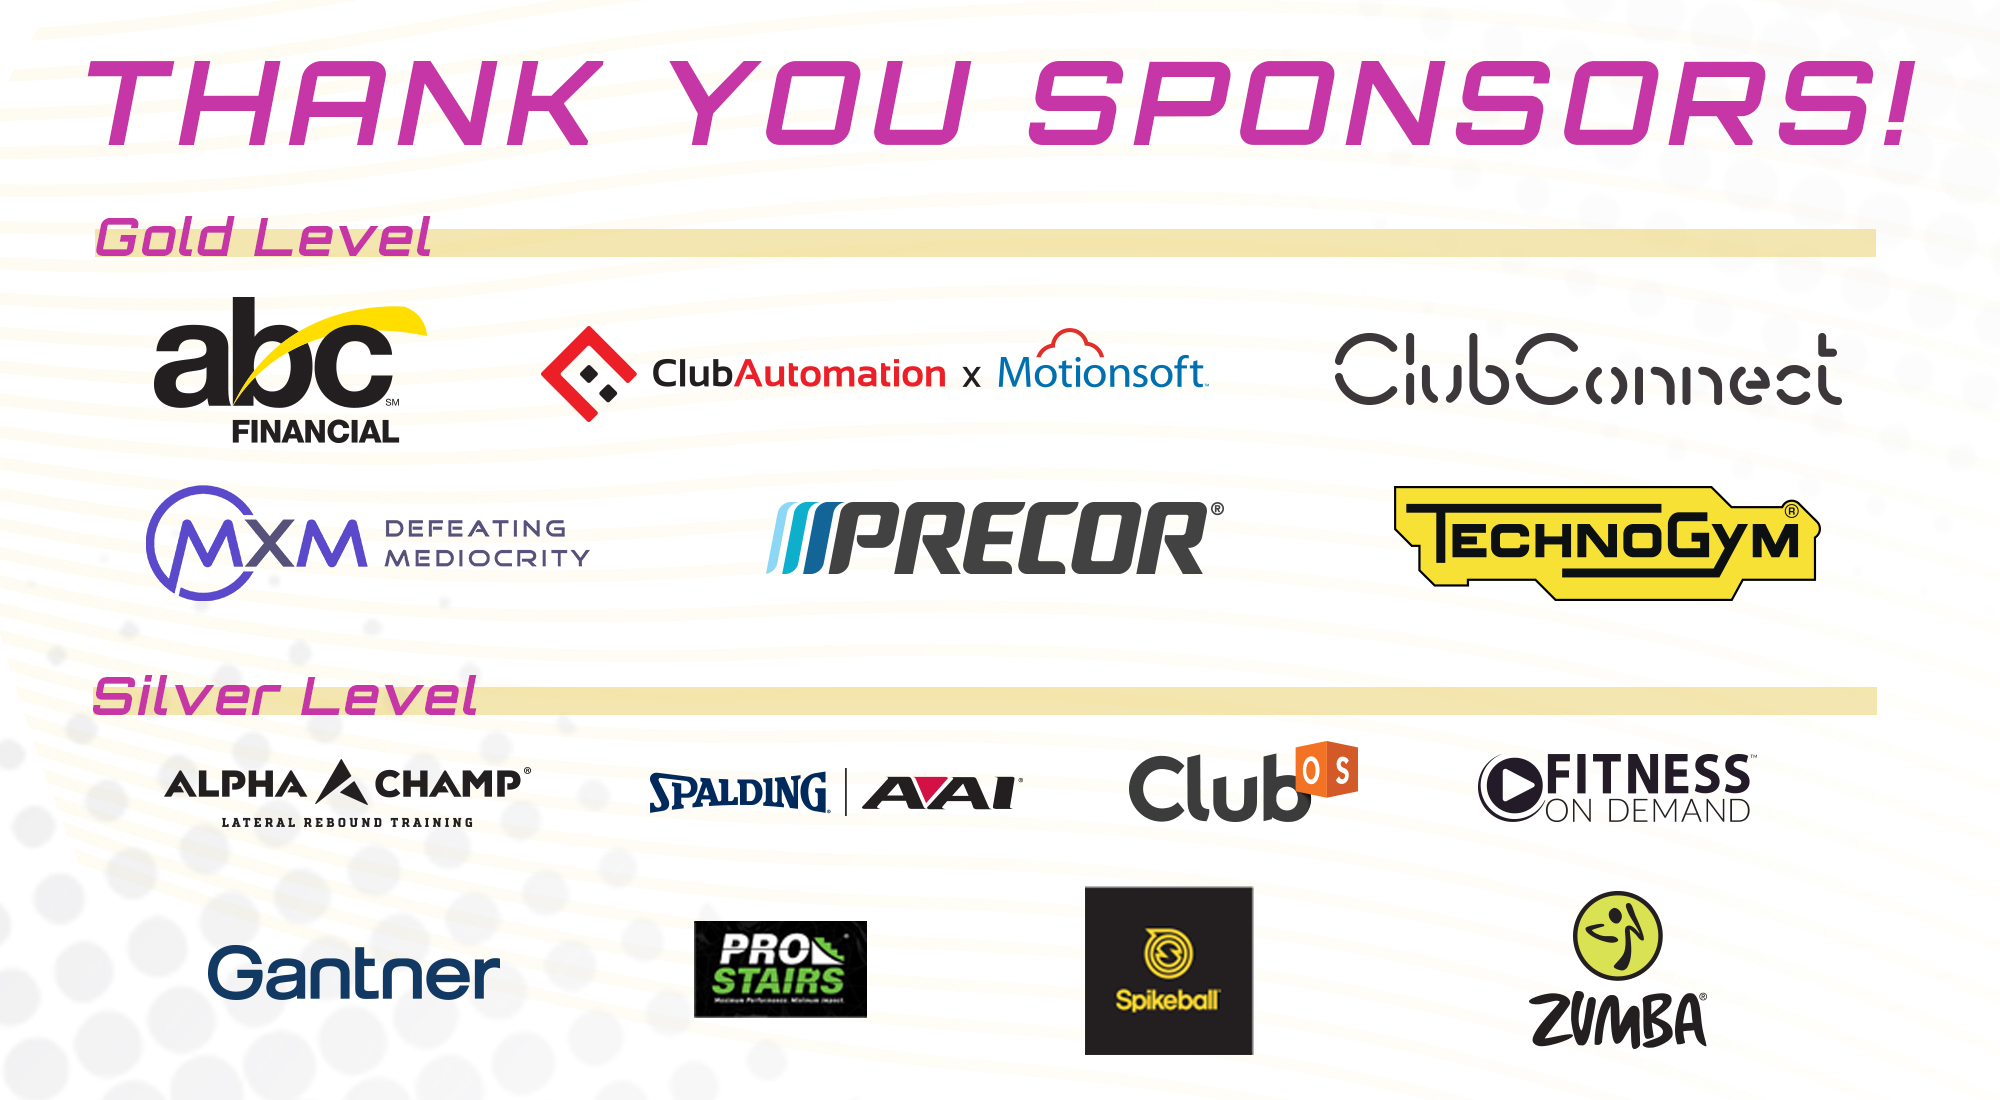 20IS-sponsor-image_2000x1100